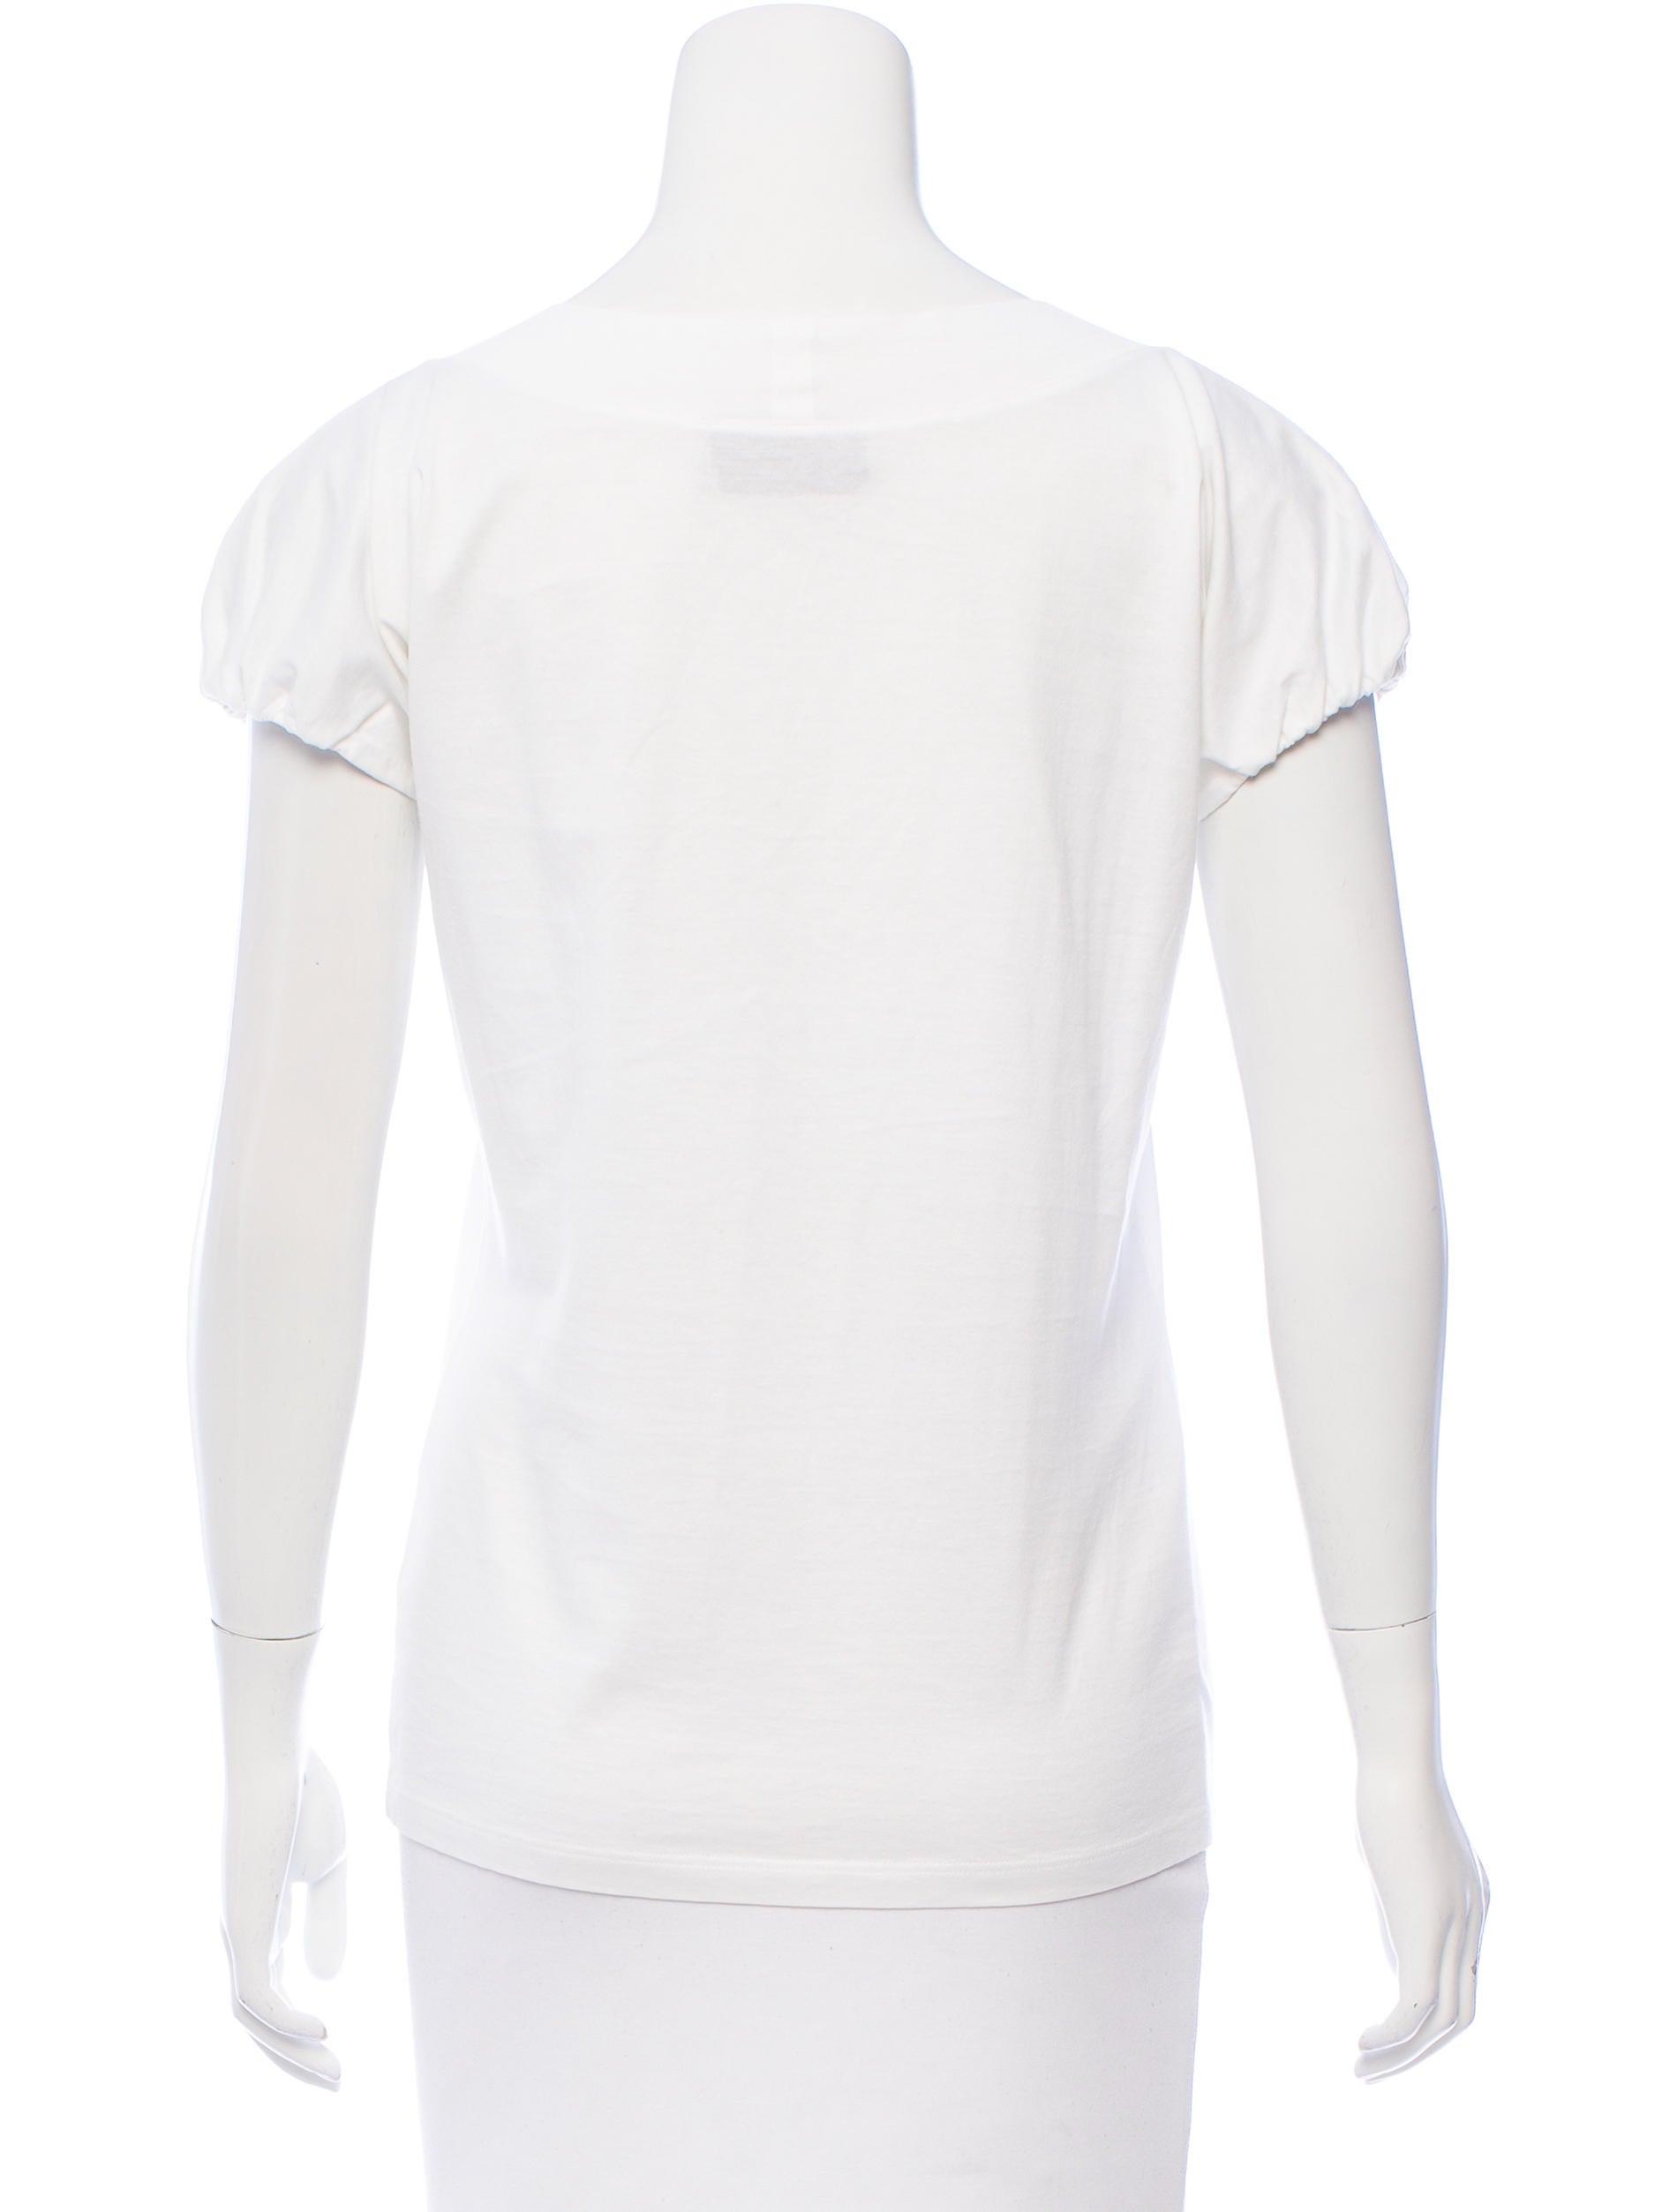 Yves saint laurent scoop neck short sleeve t shirt for Yves saint laurent white t shirt